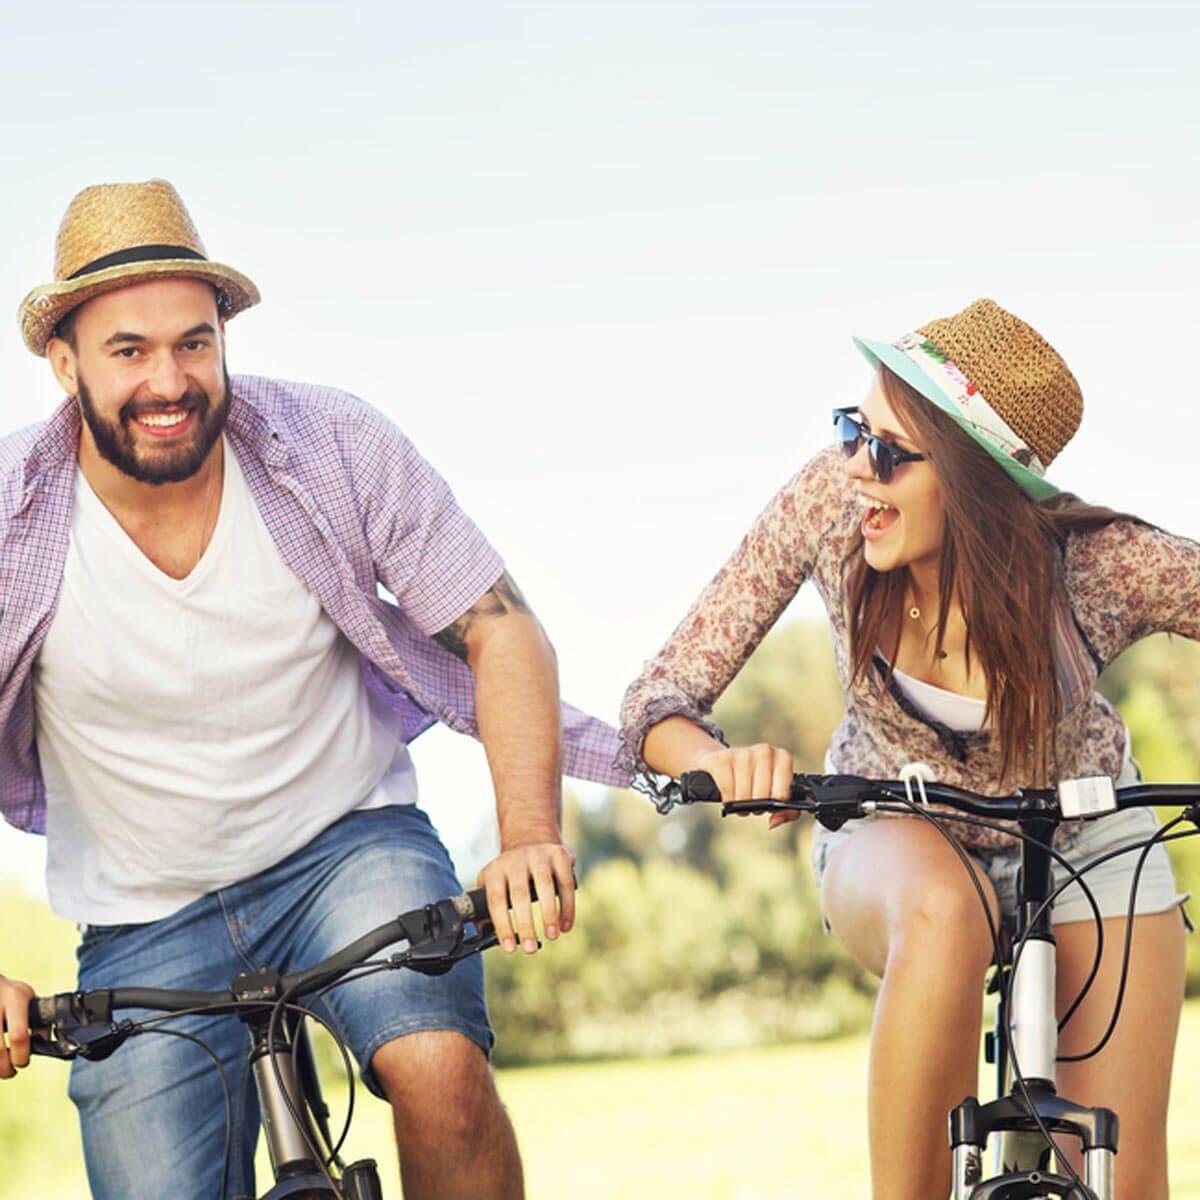 shutterstock_443128585 riding bikes vacation